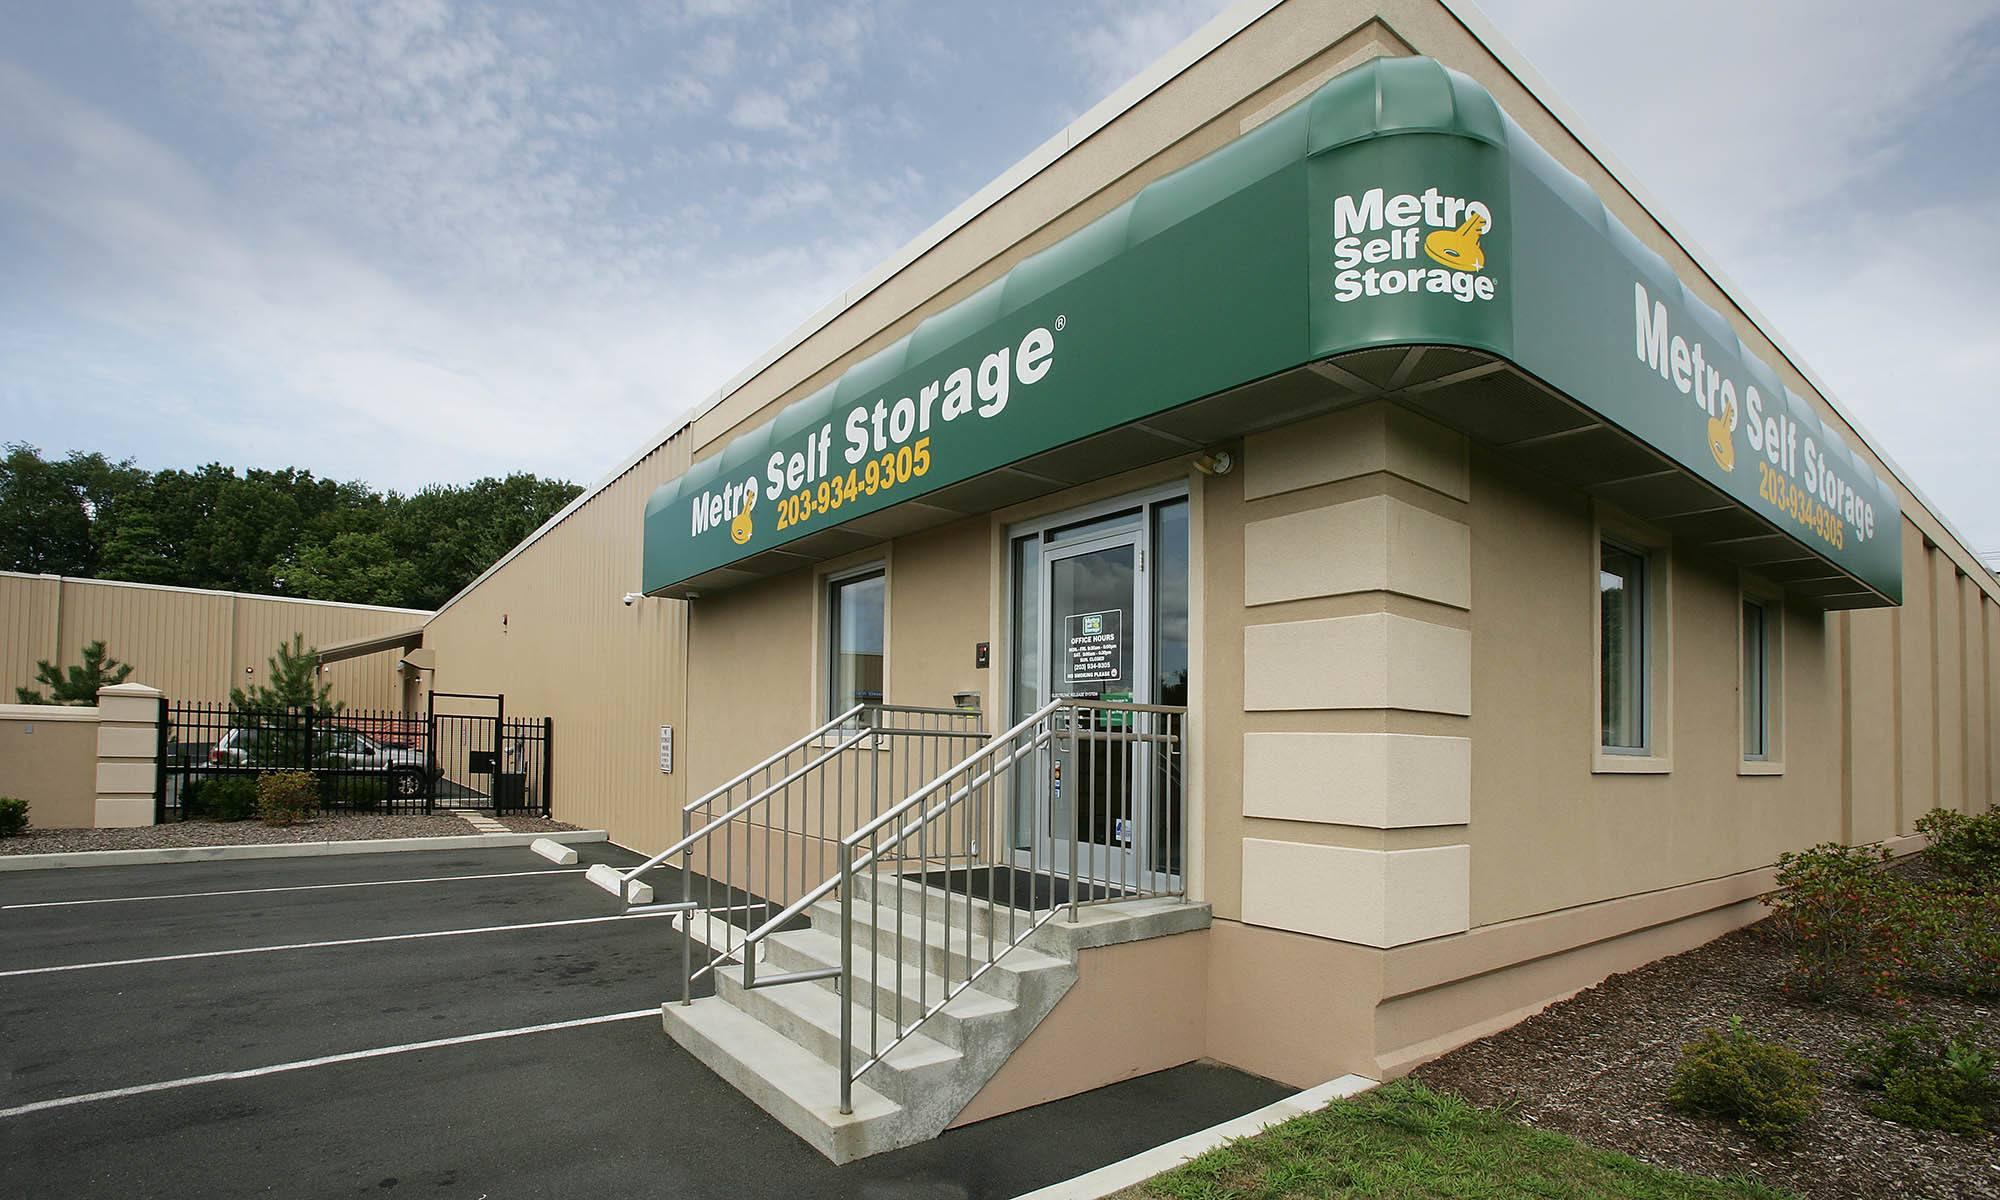 Metro Self Storage in West Haven, CT